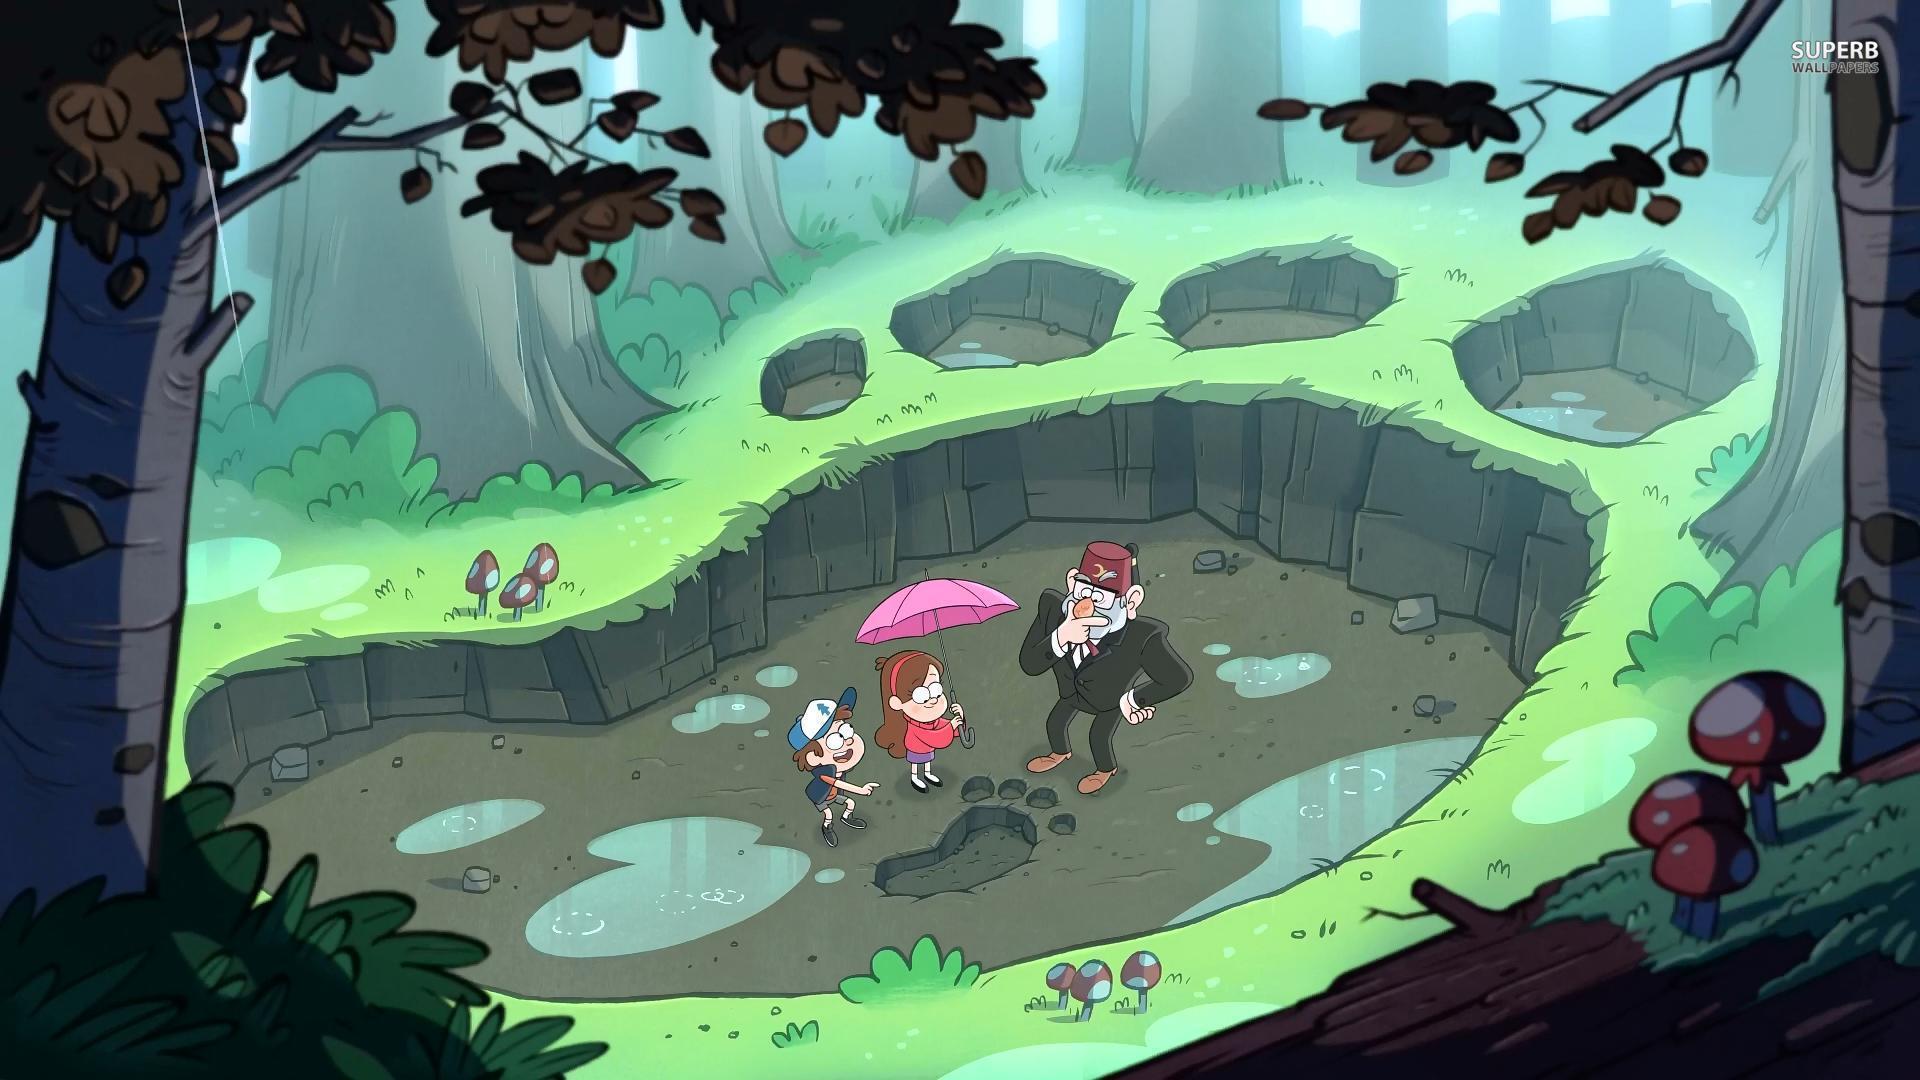 Gravity Falls Bill Cipher Wallpaper Phone Quot Gravity Falls Quot Creator Cancels Series After 2 Seasons